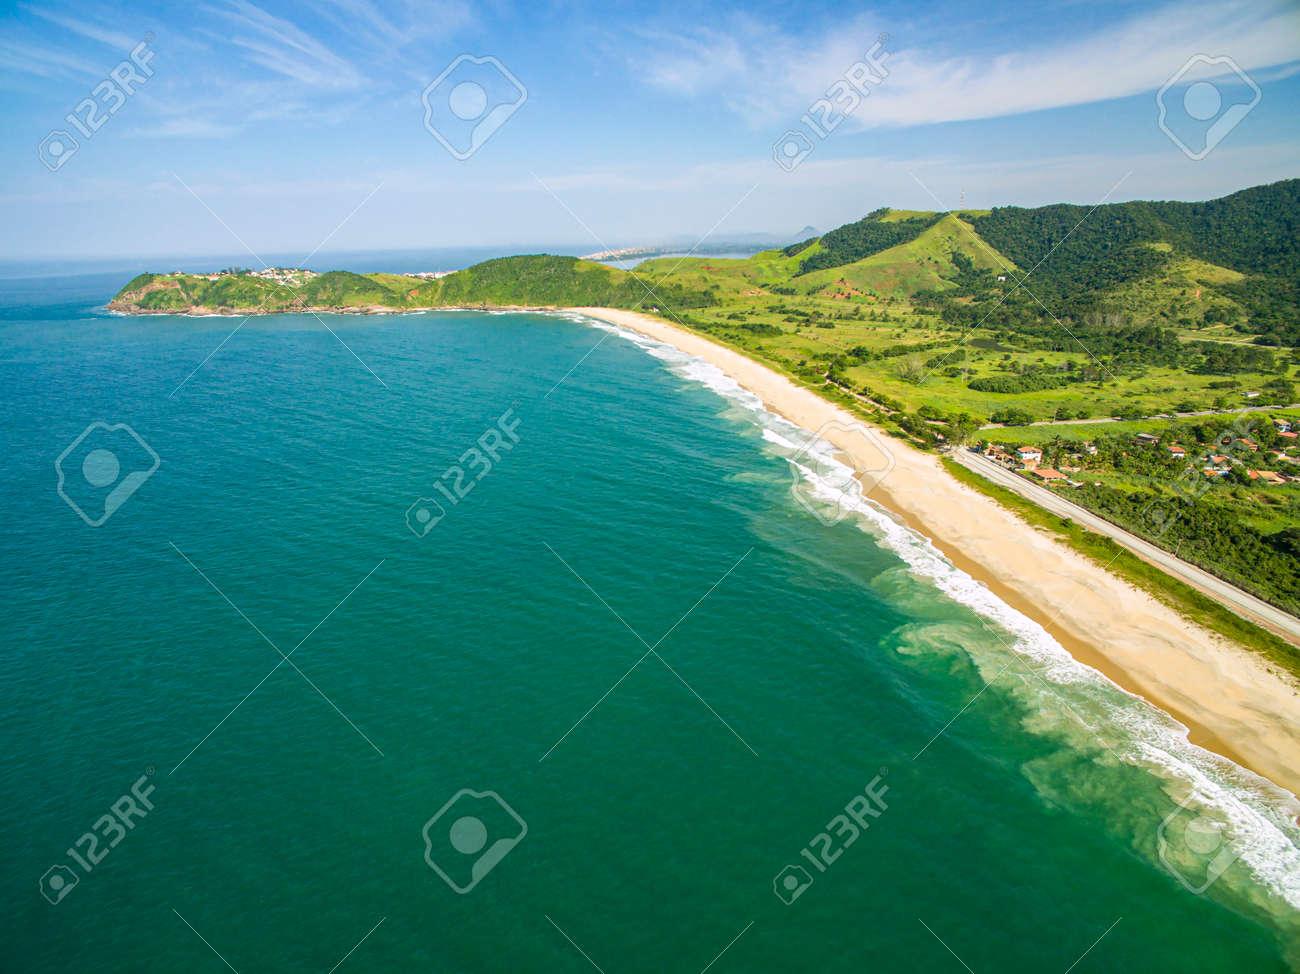 Deserted beach. Beautiful sunny coast view. - 169121462